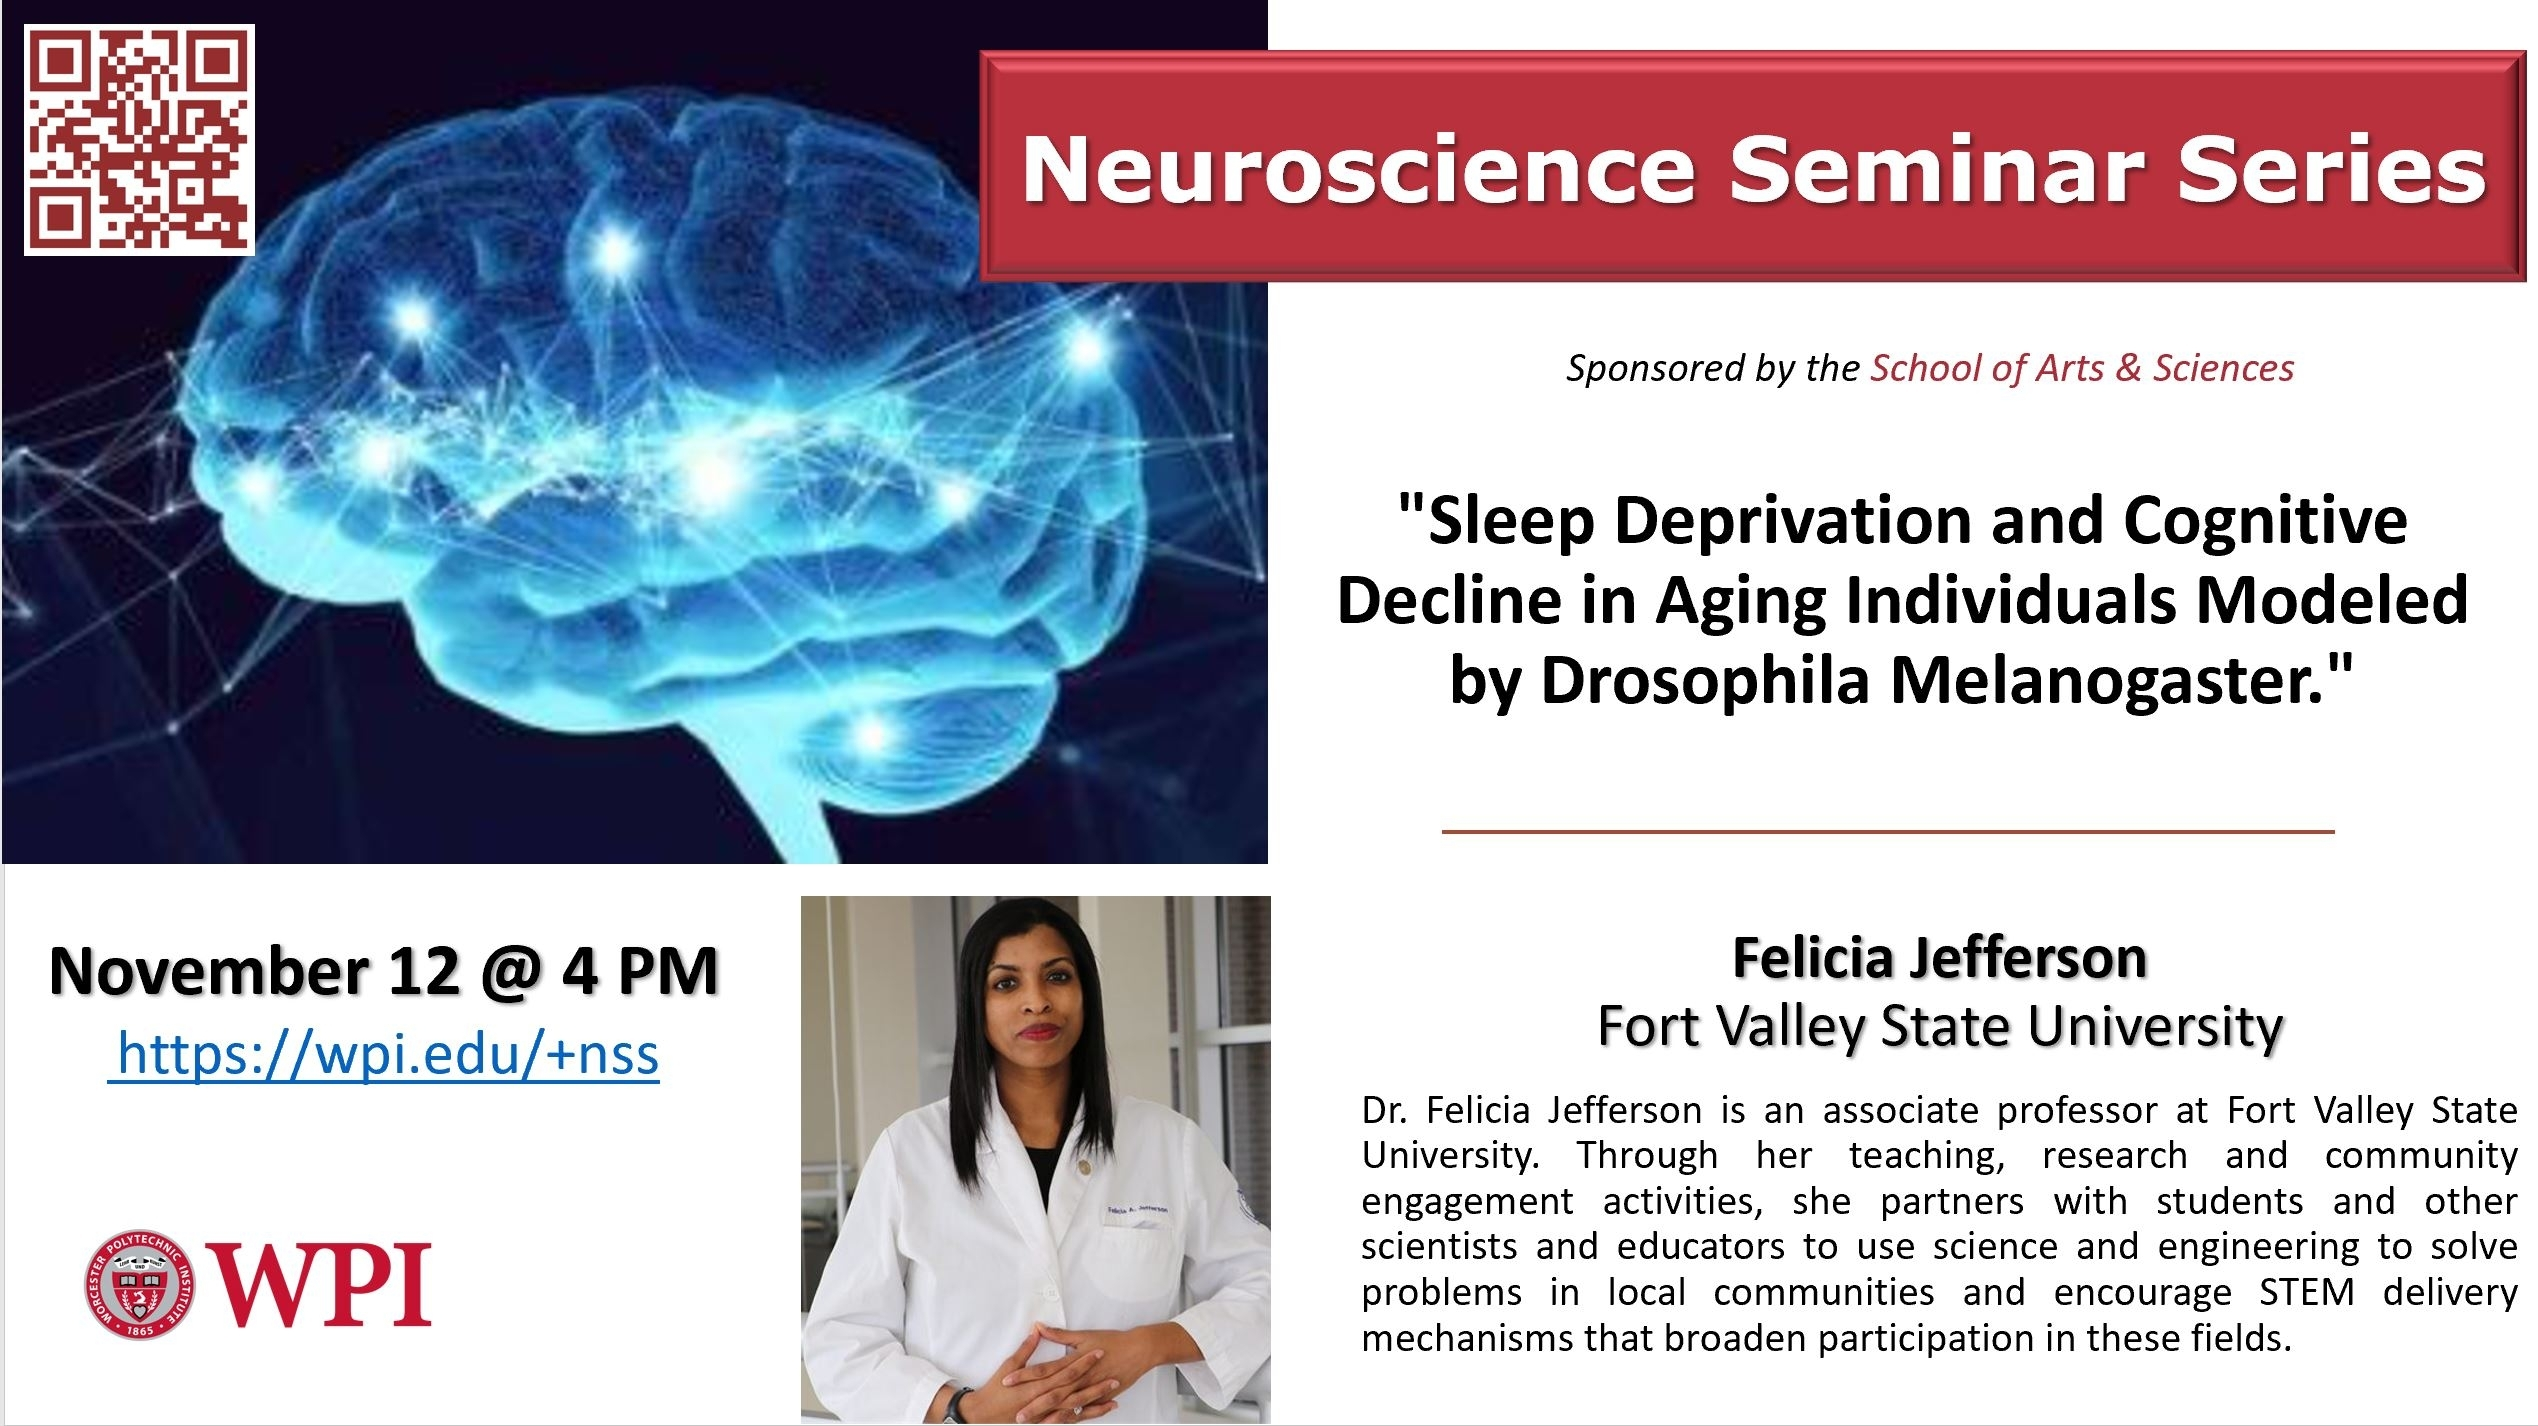 Neuroscience Seminar Series | Events | Calendar | News | Wpi